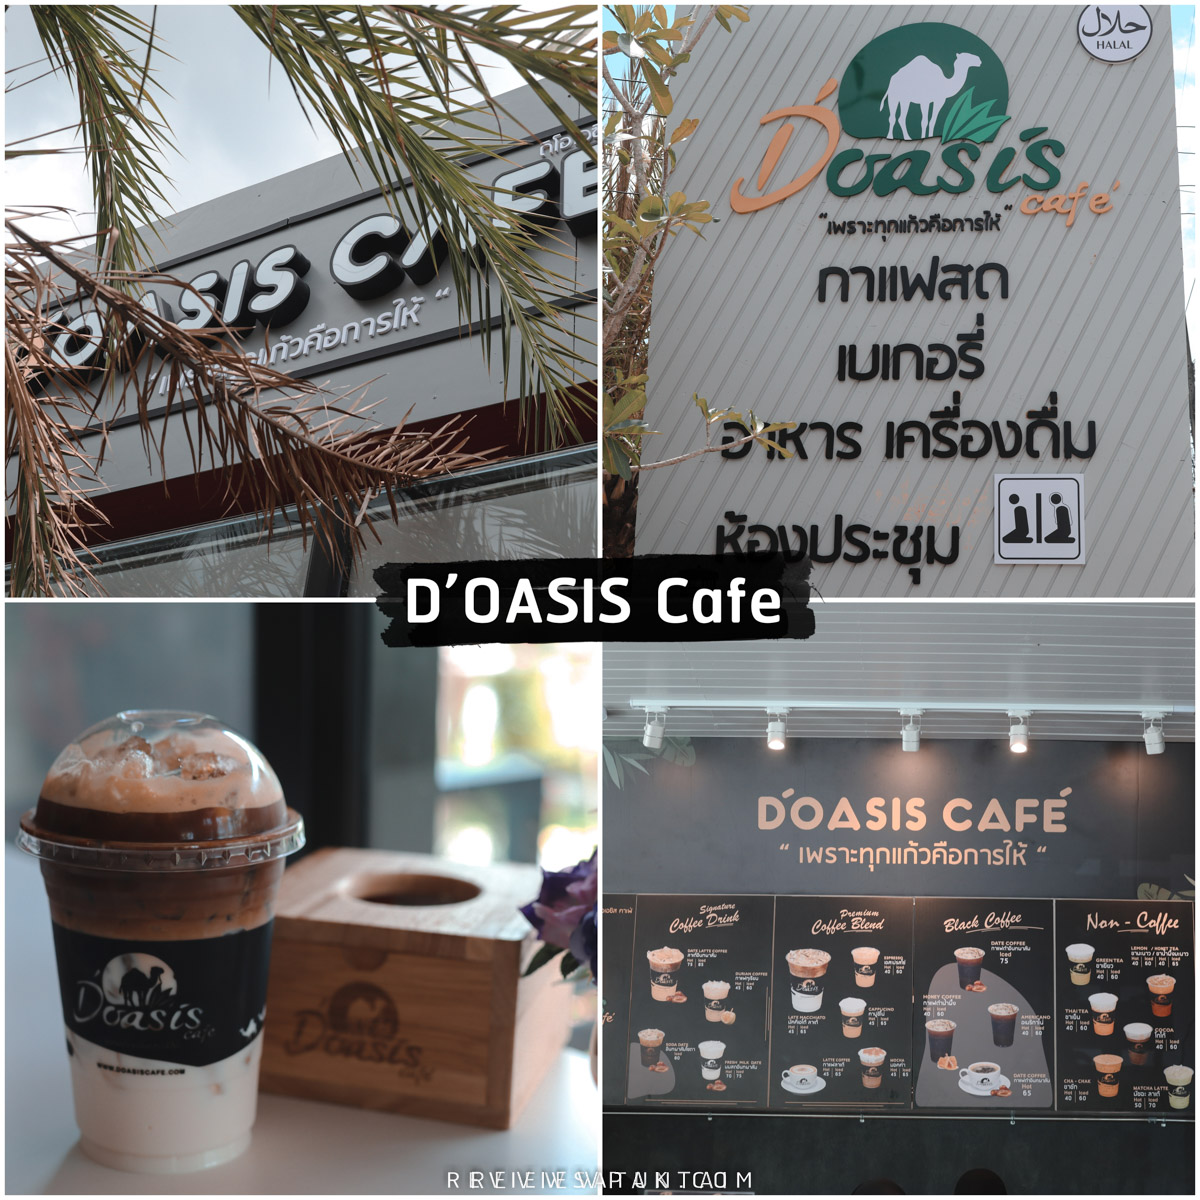 D'Oasis คาเฟ่สุดสวยทางเข้าเมืองสตูล กาแฟ โกโก้อร่อย รายละเอียด คลิก จุดเช็คอิน,หลีเป๊ะ,สตูลสดยกกำลังสาม,satunwonderland,เที่ยวเมืองไทยAmazingกว่าเดิม,ชีพจรลงSouth